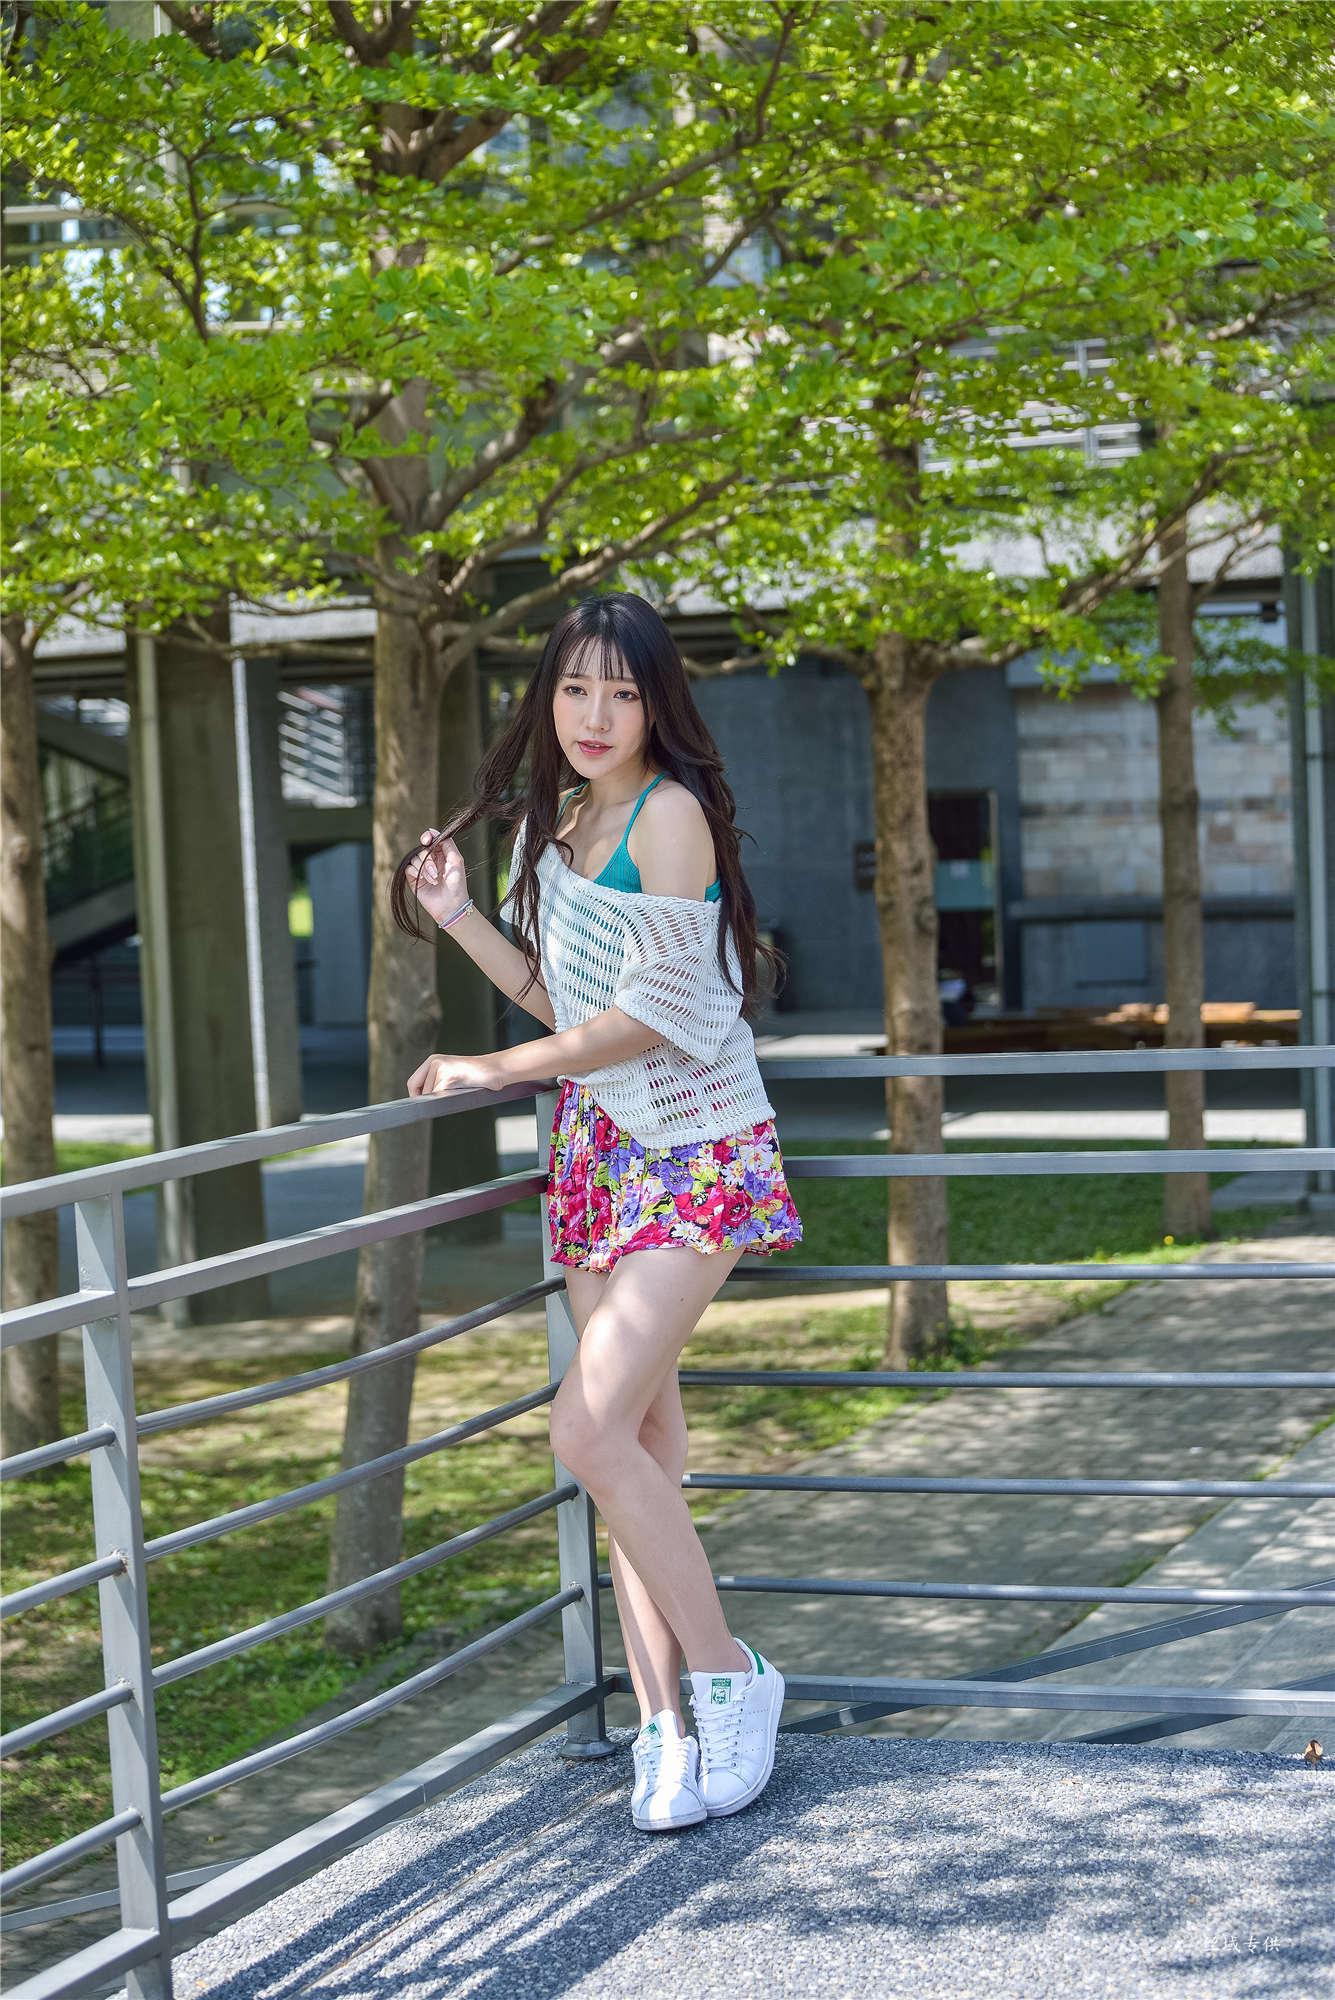 VOL.1174 [台湾正妹]正妹萌女街拍美腿:比比儿(Katie Chiu)超高清个人性感漂亮大图(107P)